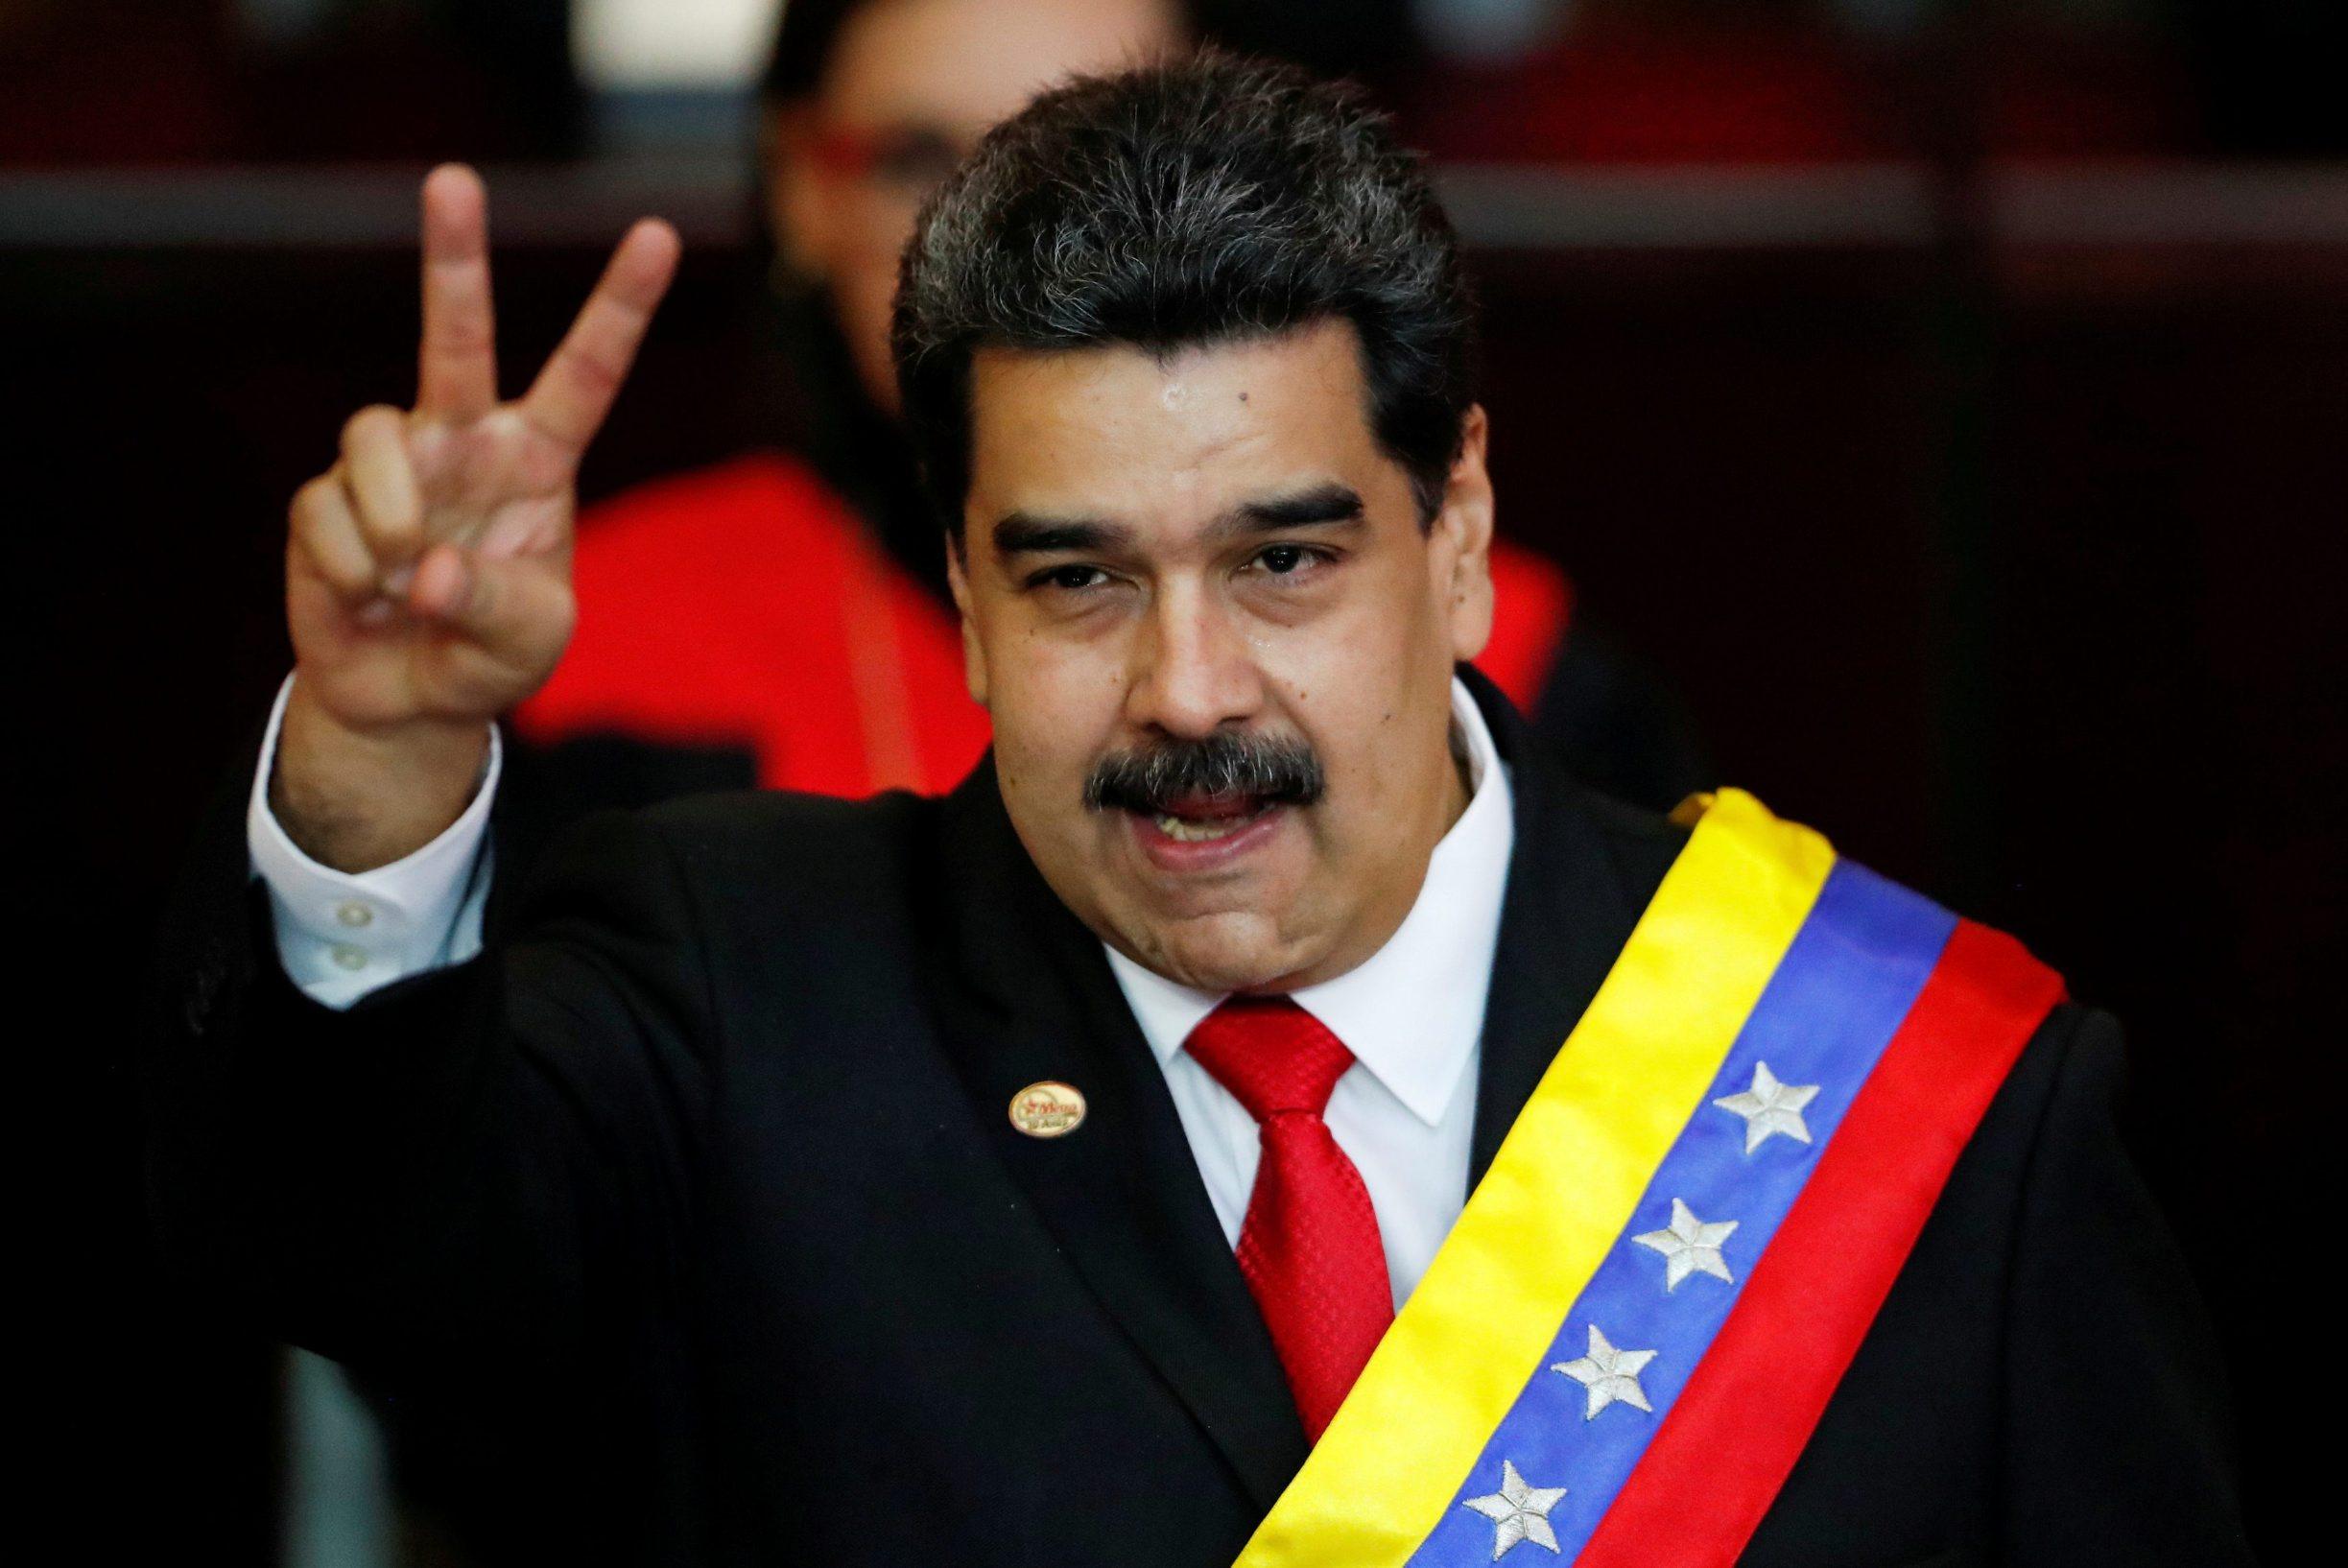 Predsjednik Venezuele Nicolas Maduro